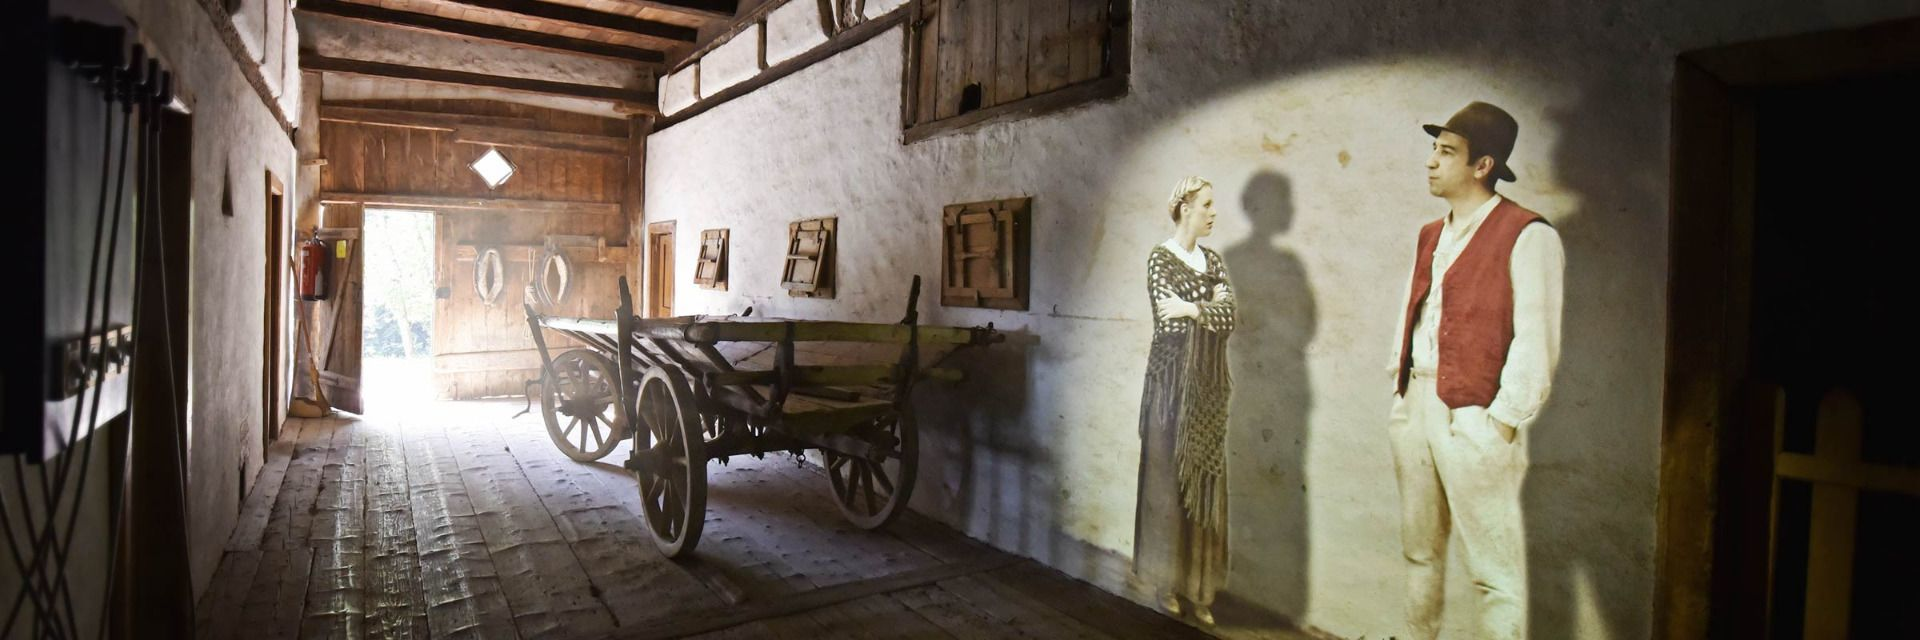 Museum Tiroler Bauernhöfe